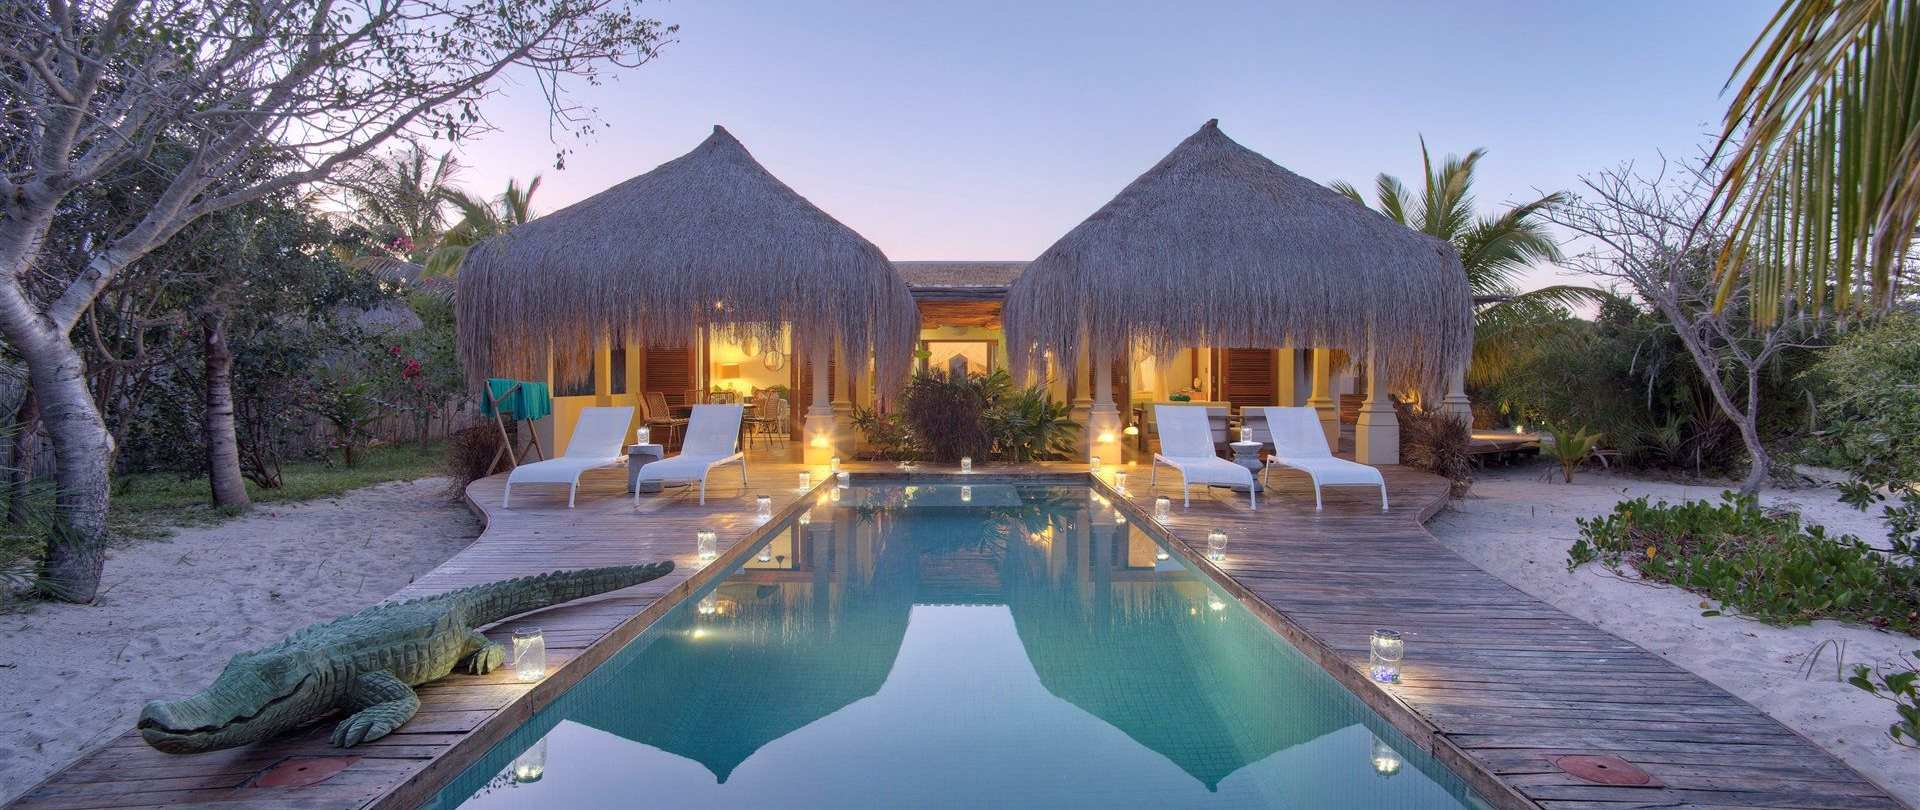 100 hotel de luxe corse la deluxe hotel hotels de. Black Bedroom Furniture Sets. Home Design Ideas